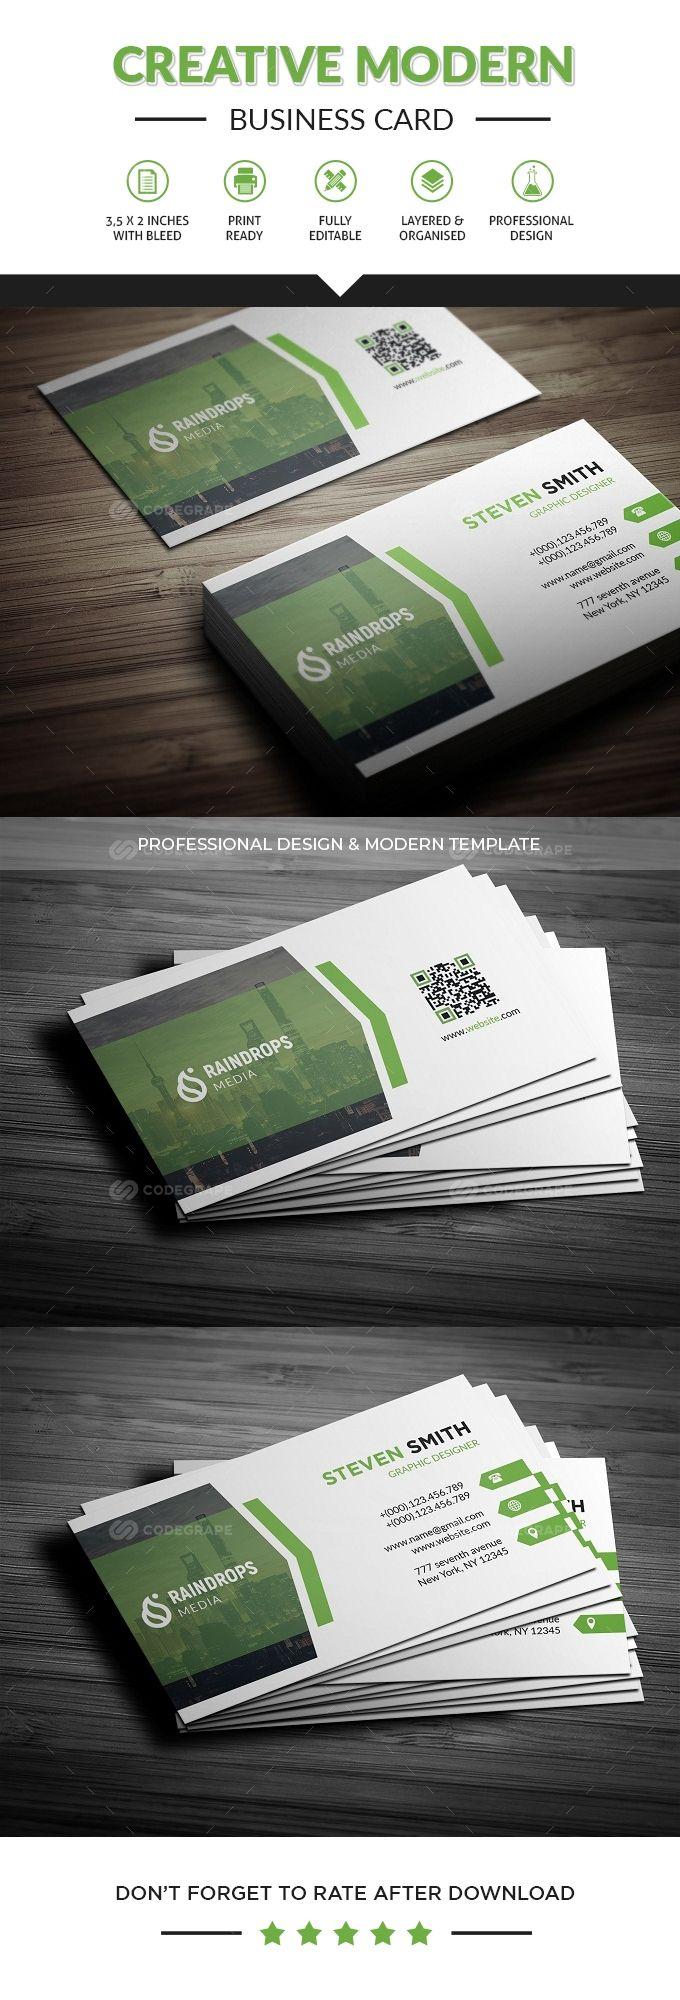 Corporate Business Card Business Card Template Psd Business Cards Modern Business Cards